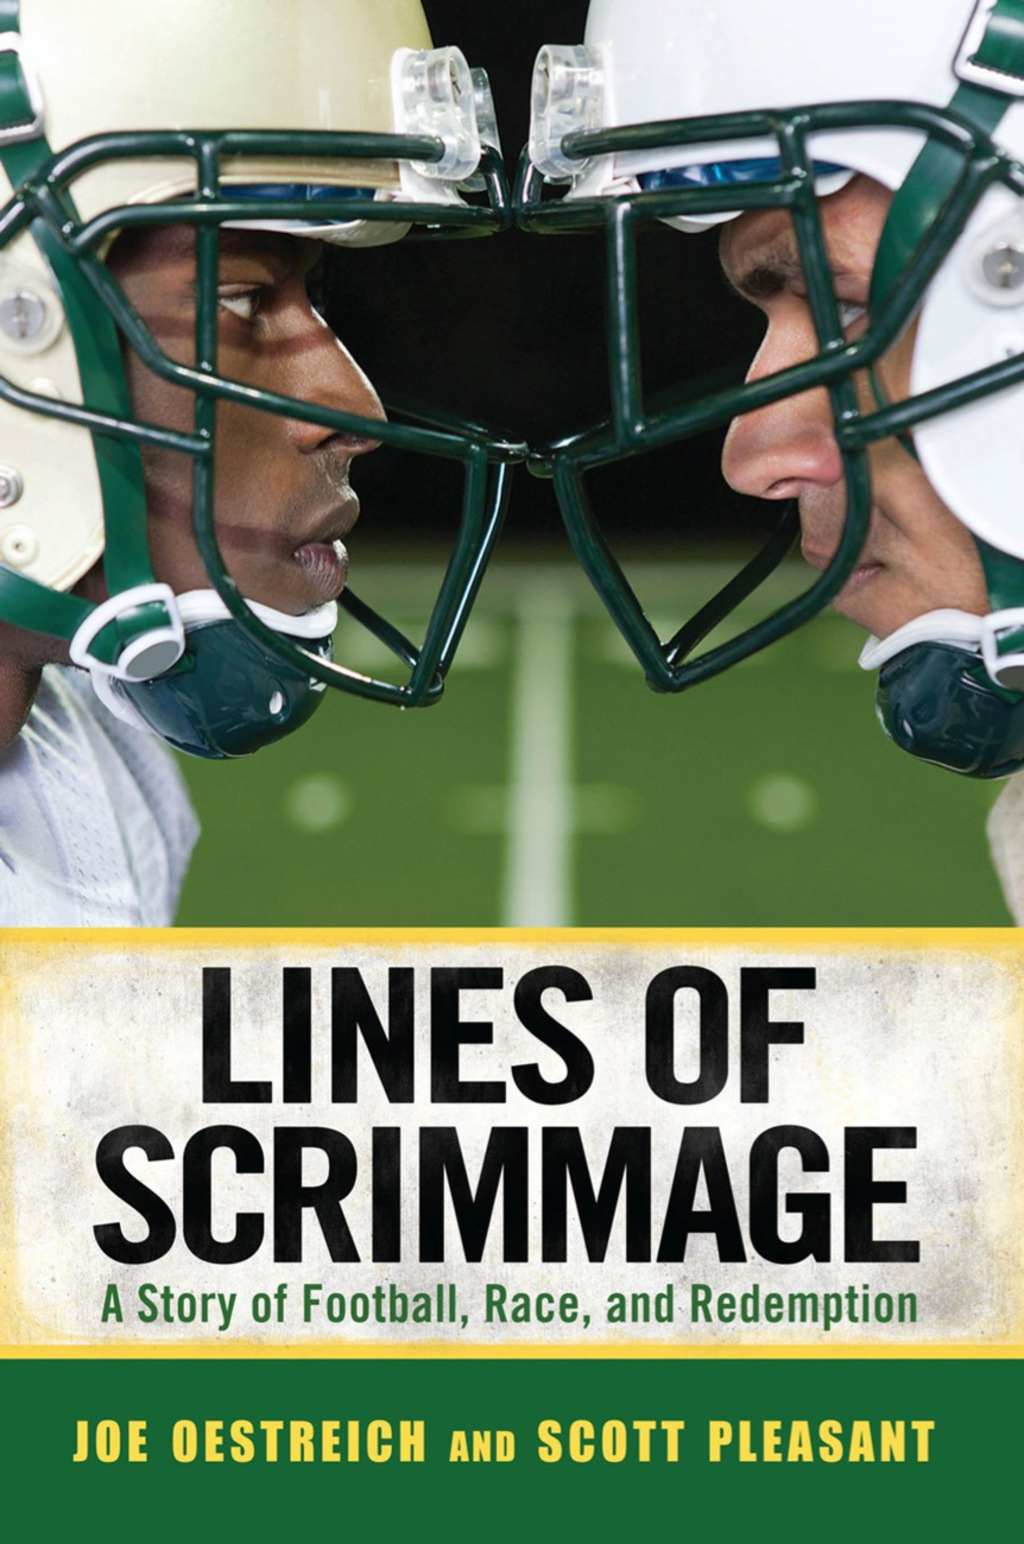 Lines of Scrimmage (eBook)